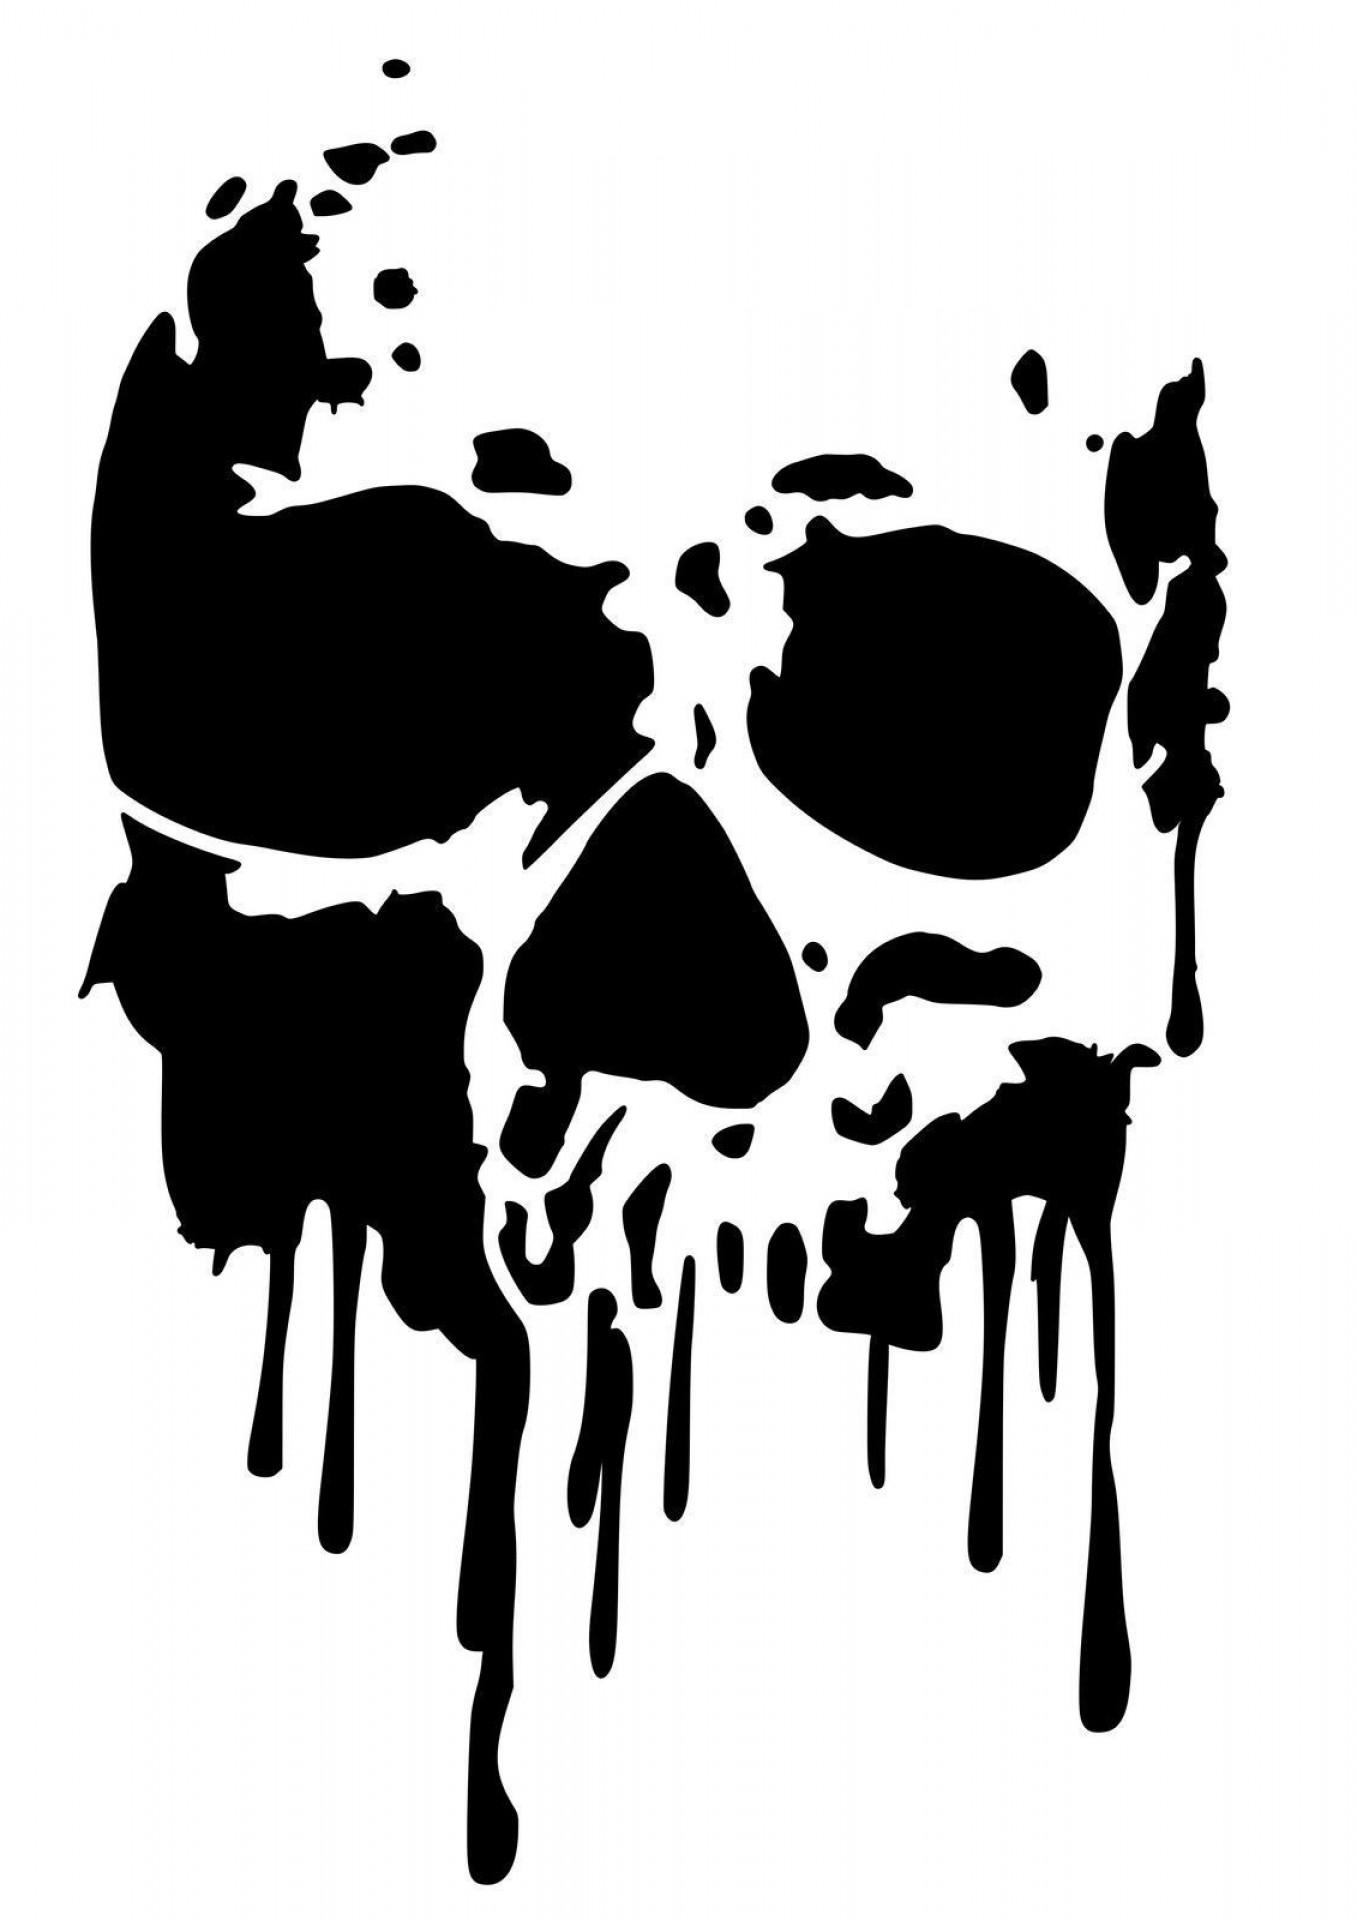 Free Clip Art Uk High Detail Dripping Skull Airbrush Stencil.